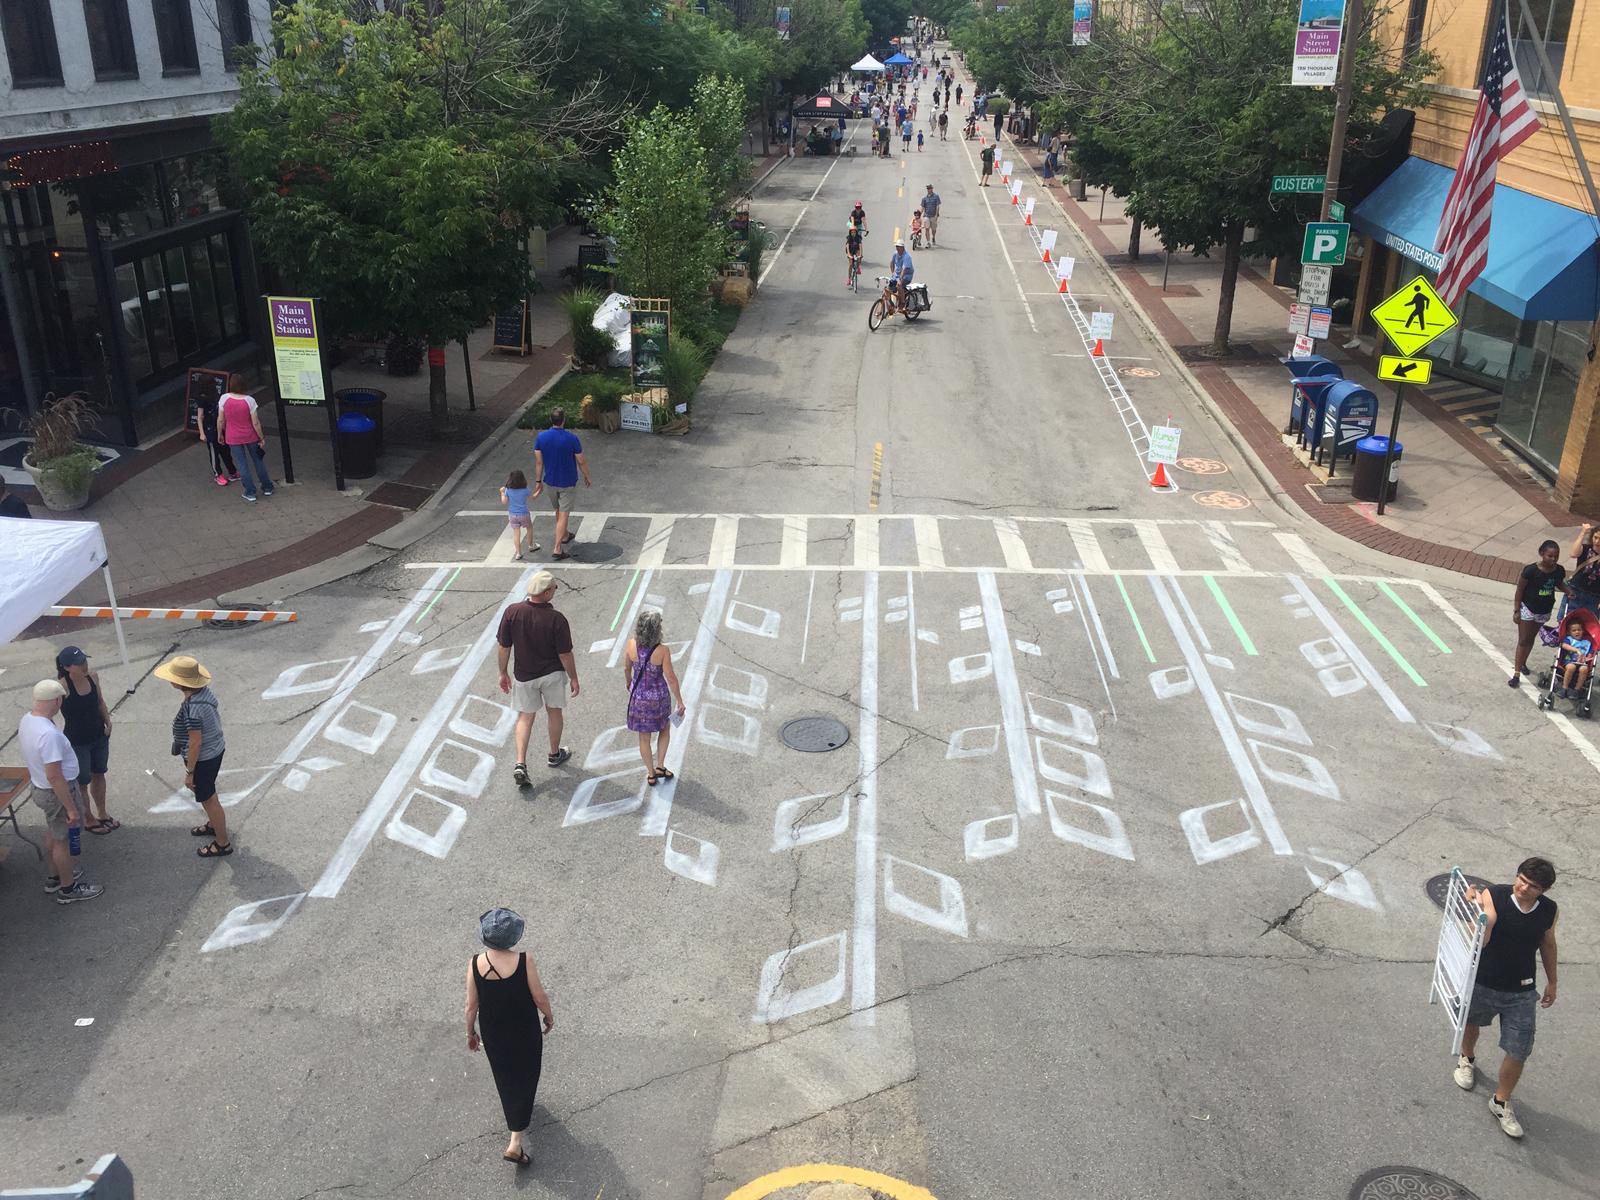 Grow | re-imagining urban spaces